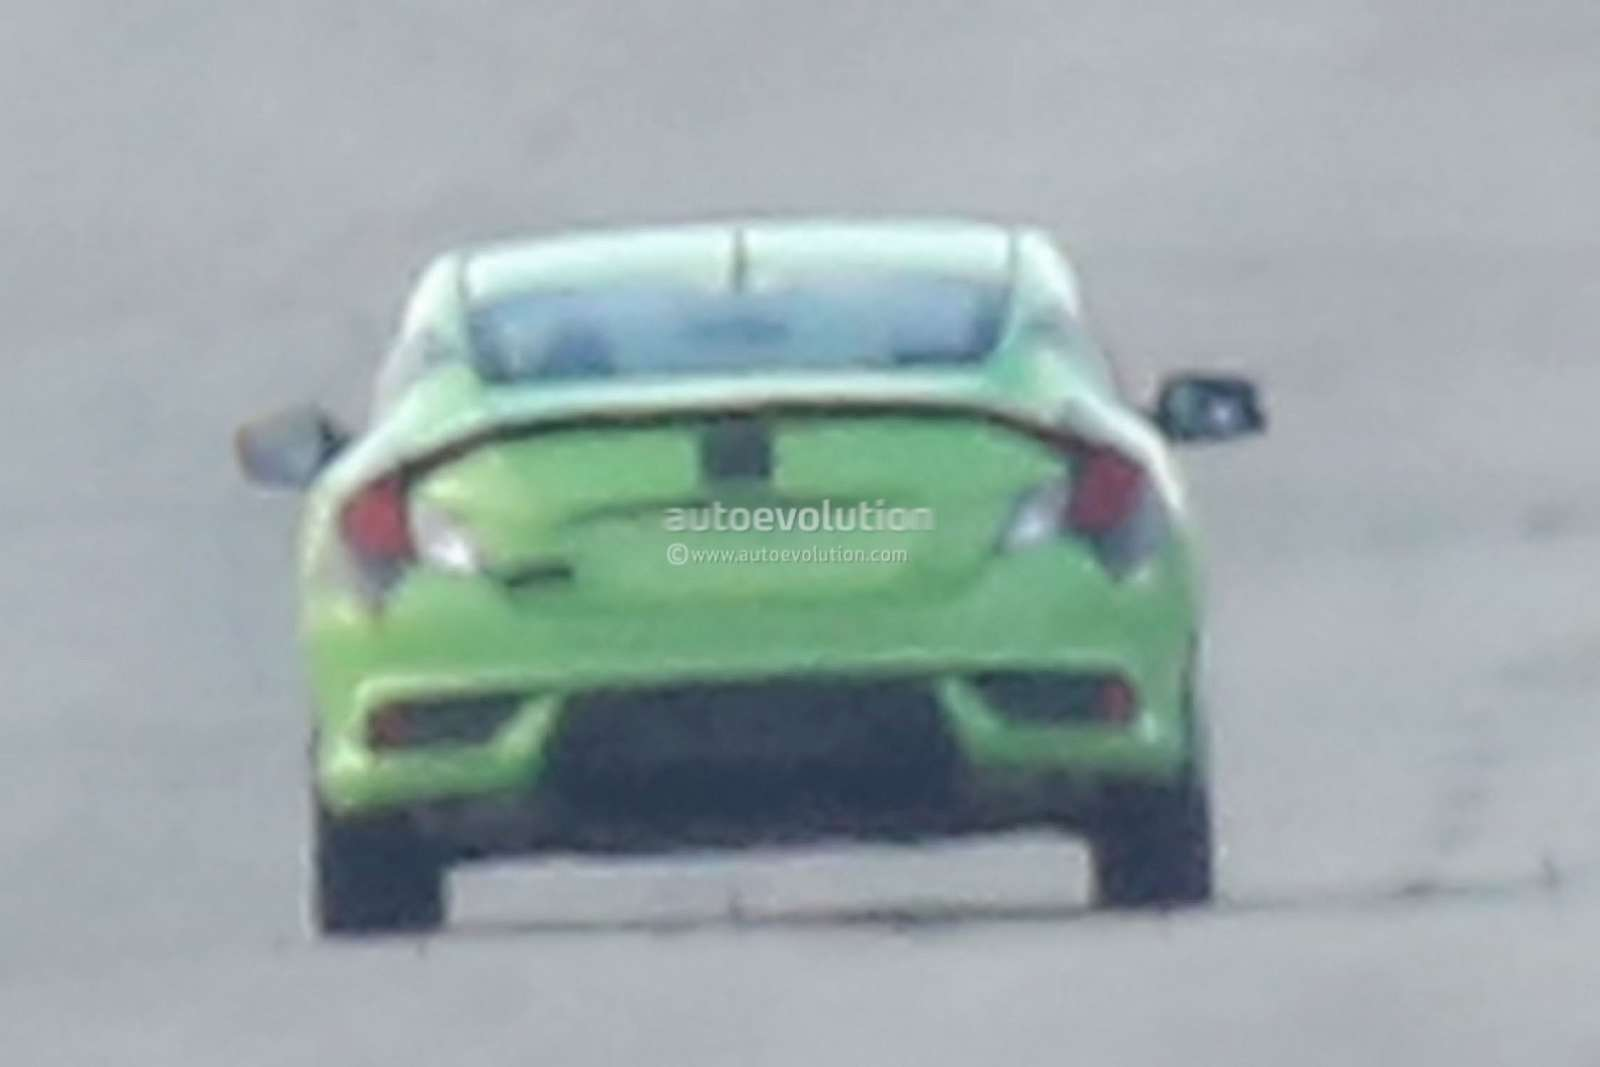 Civic Coupe rear profile